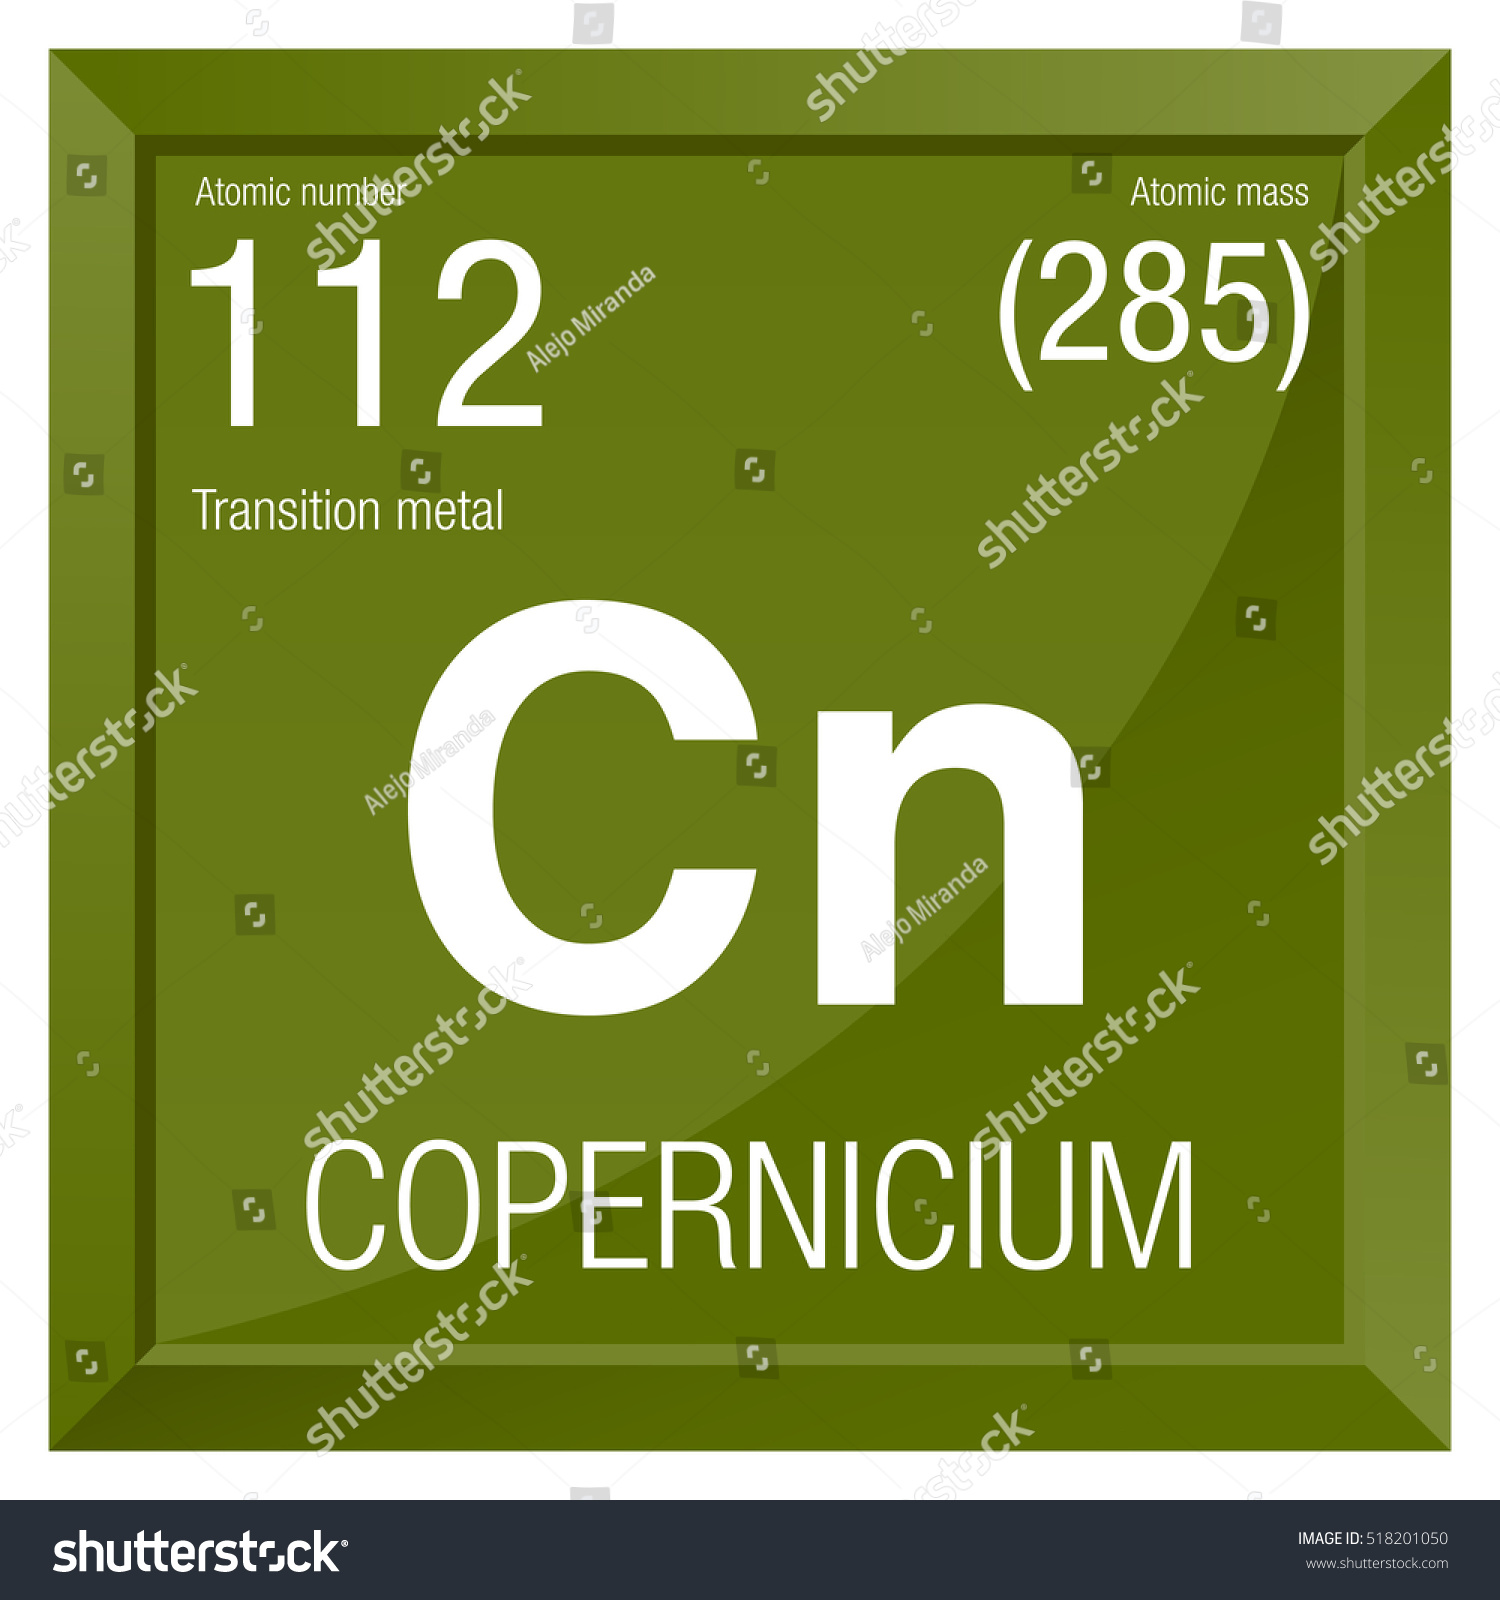 Copernicium symbol element number 112 periodic stock vector element number 112 of the periodic table of the elements chemistry gamestrikefo Image collections